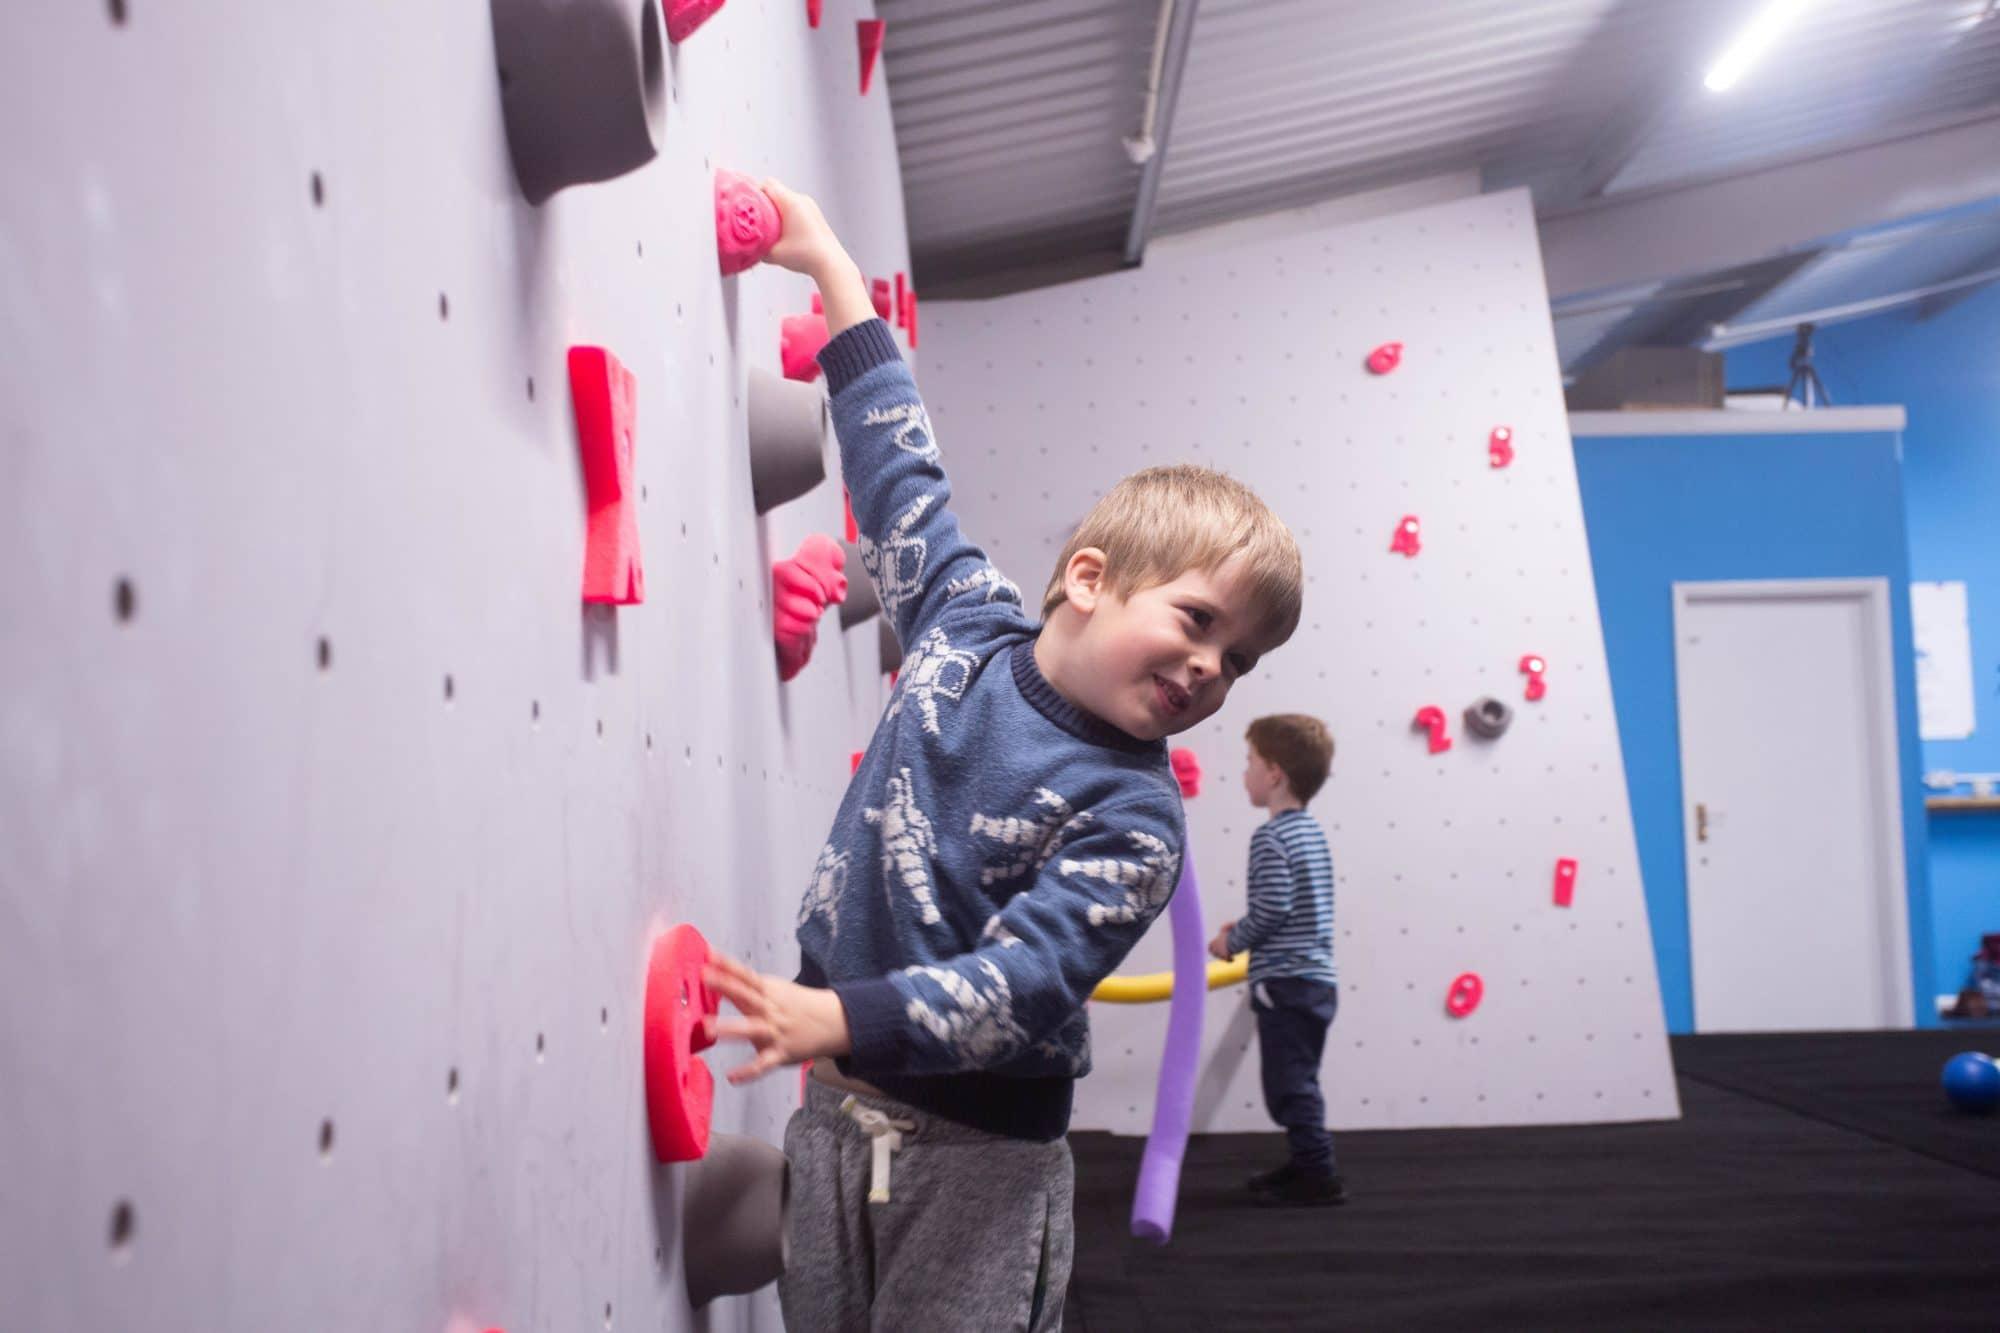 Bouldering centre private hire